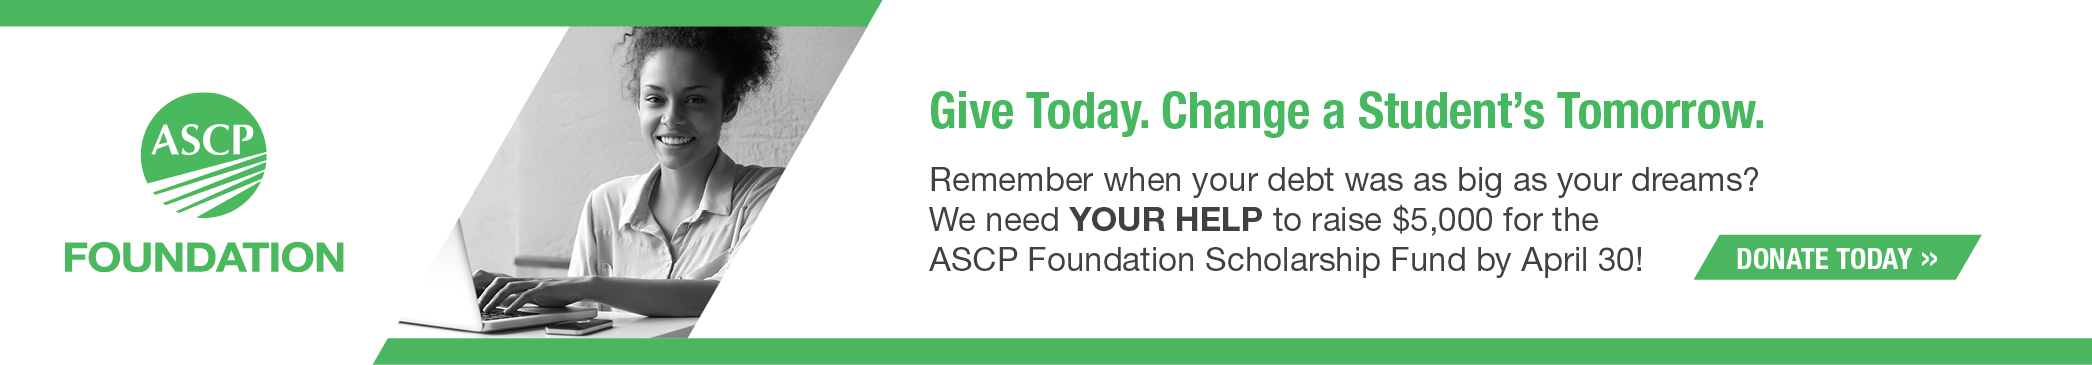 ASCP Foundation